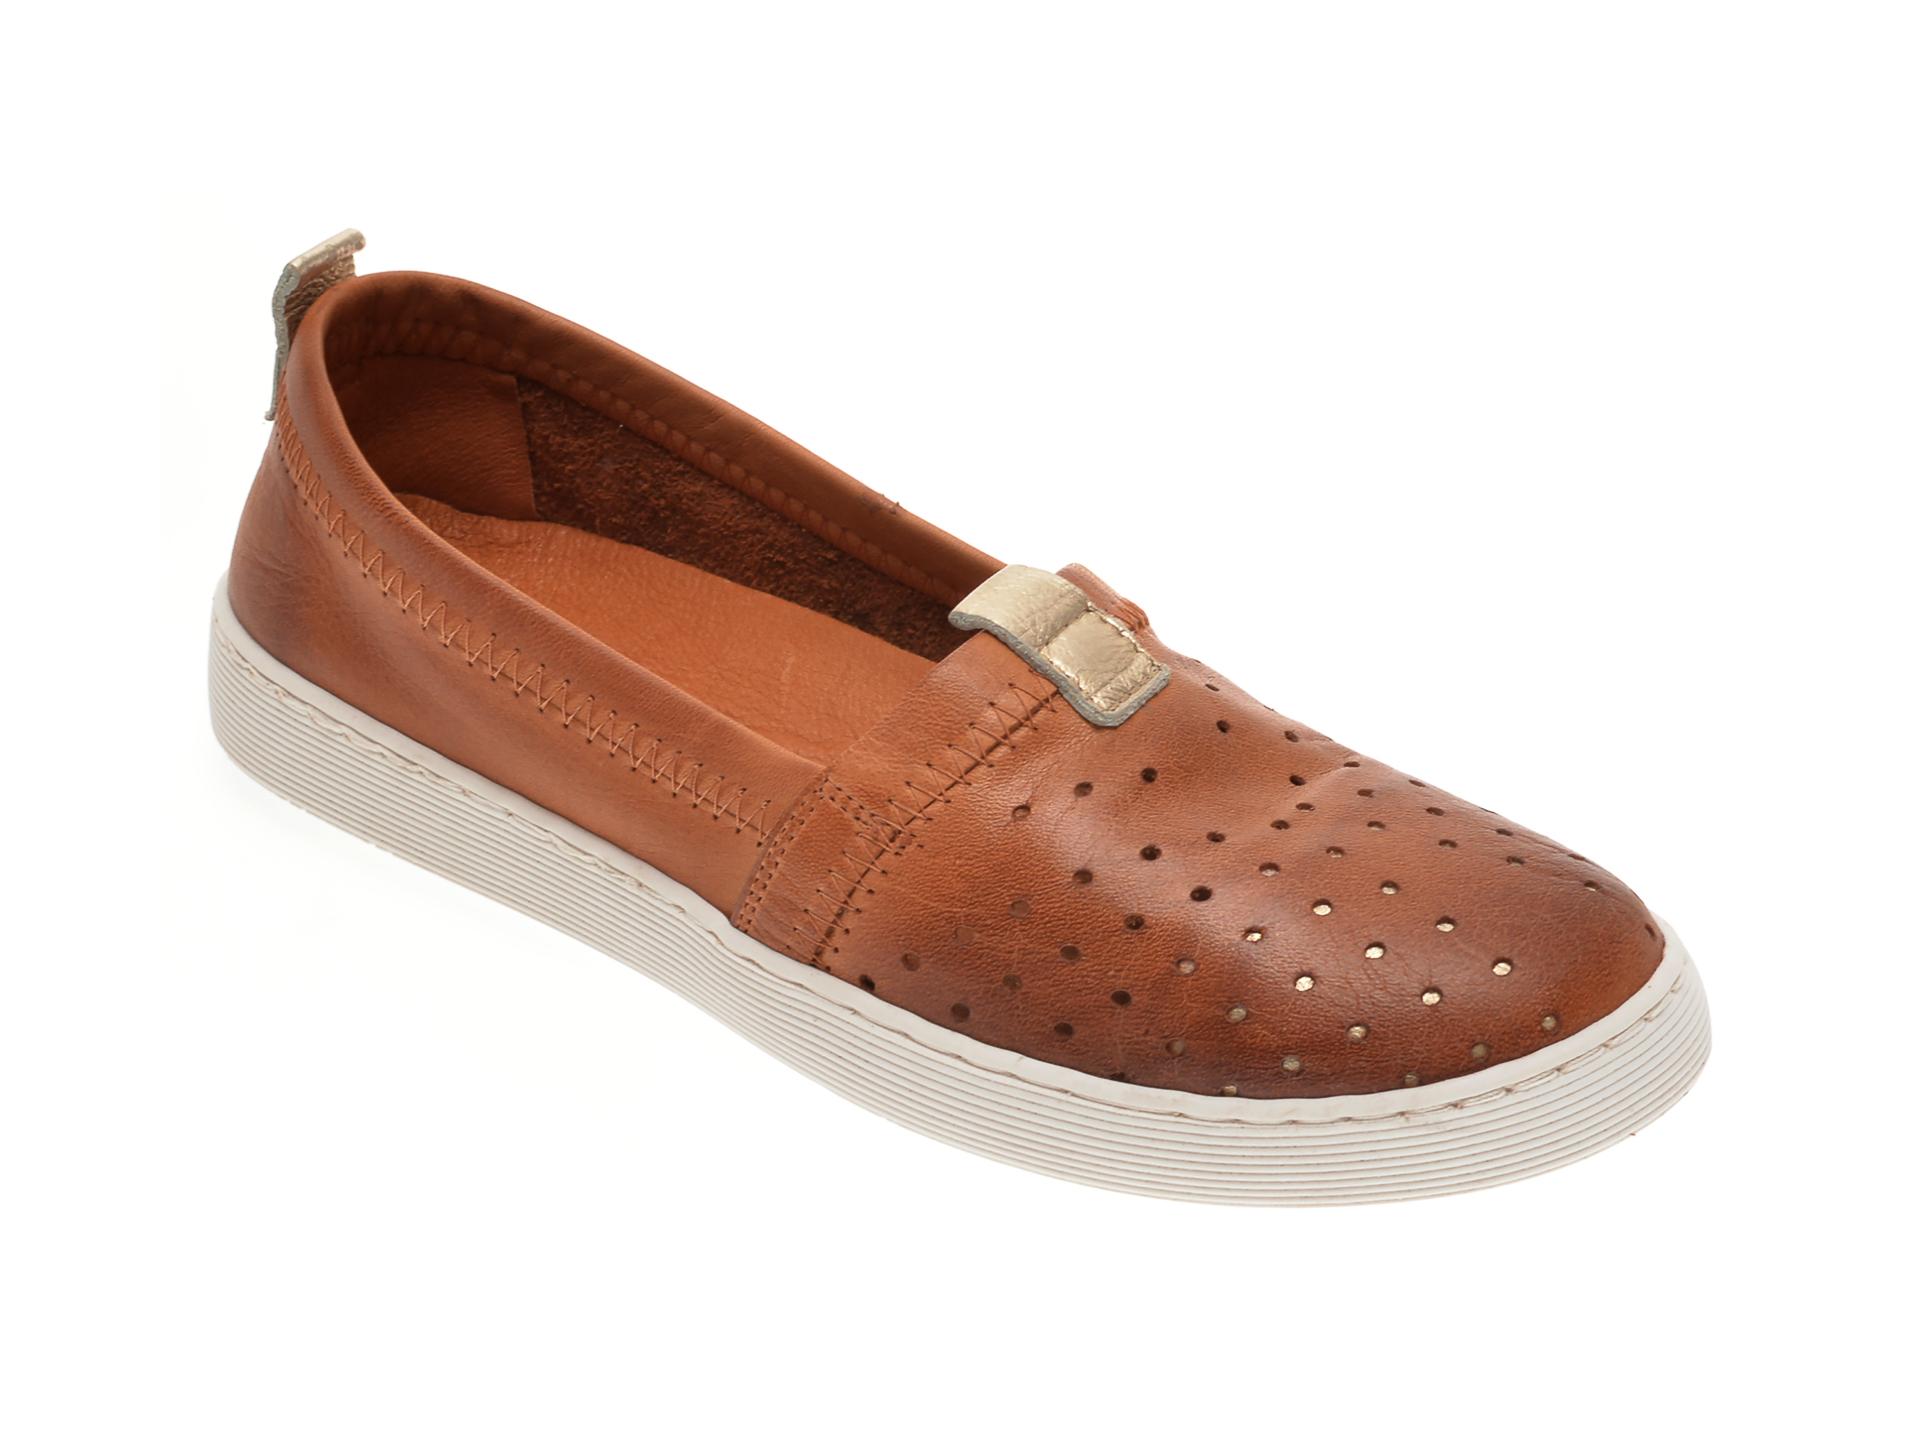 Pantofi BABOOS maro, R10, din piele naturala New